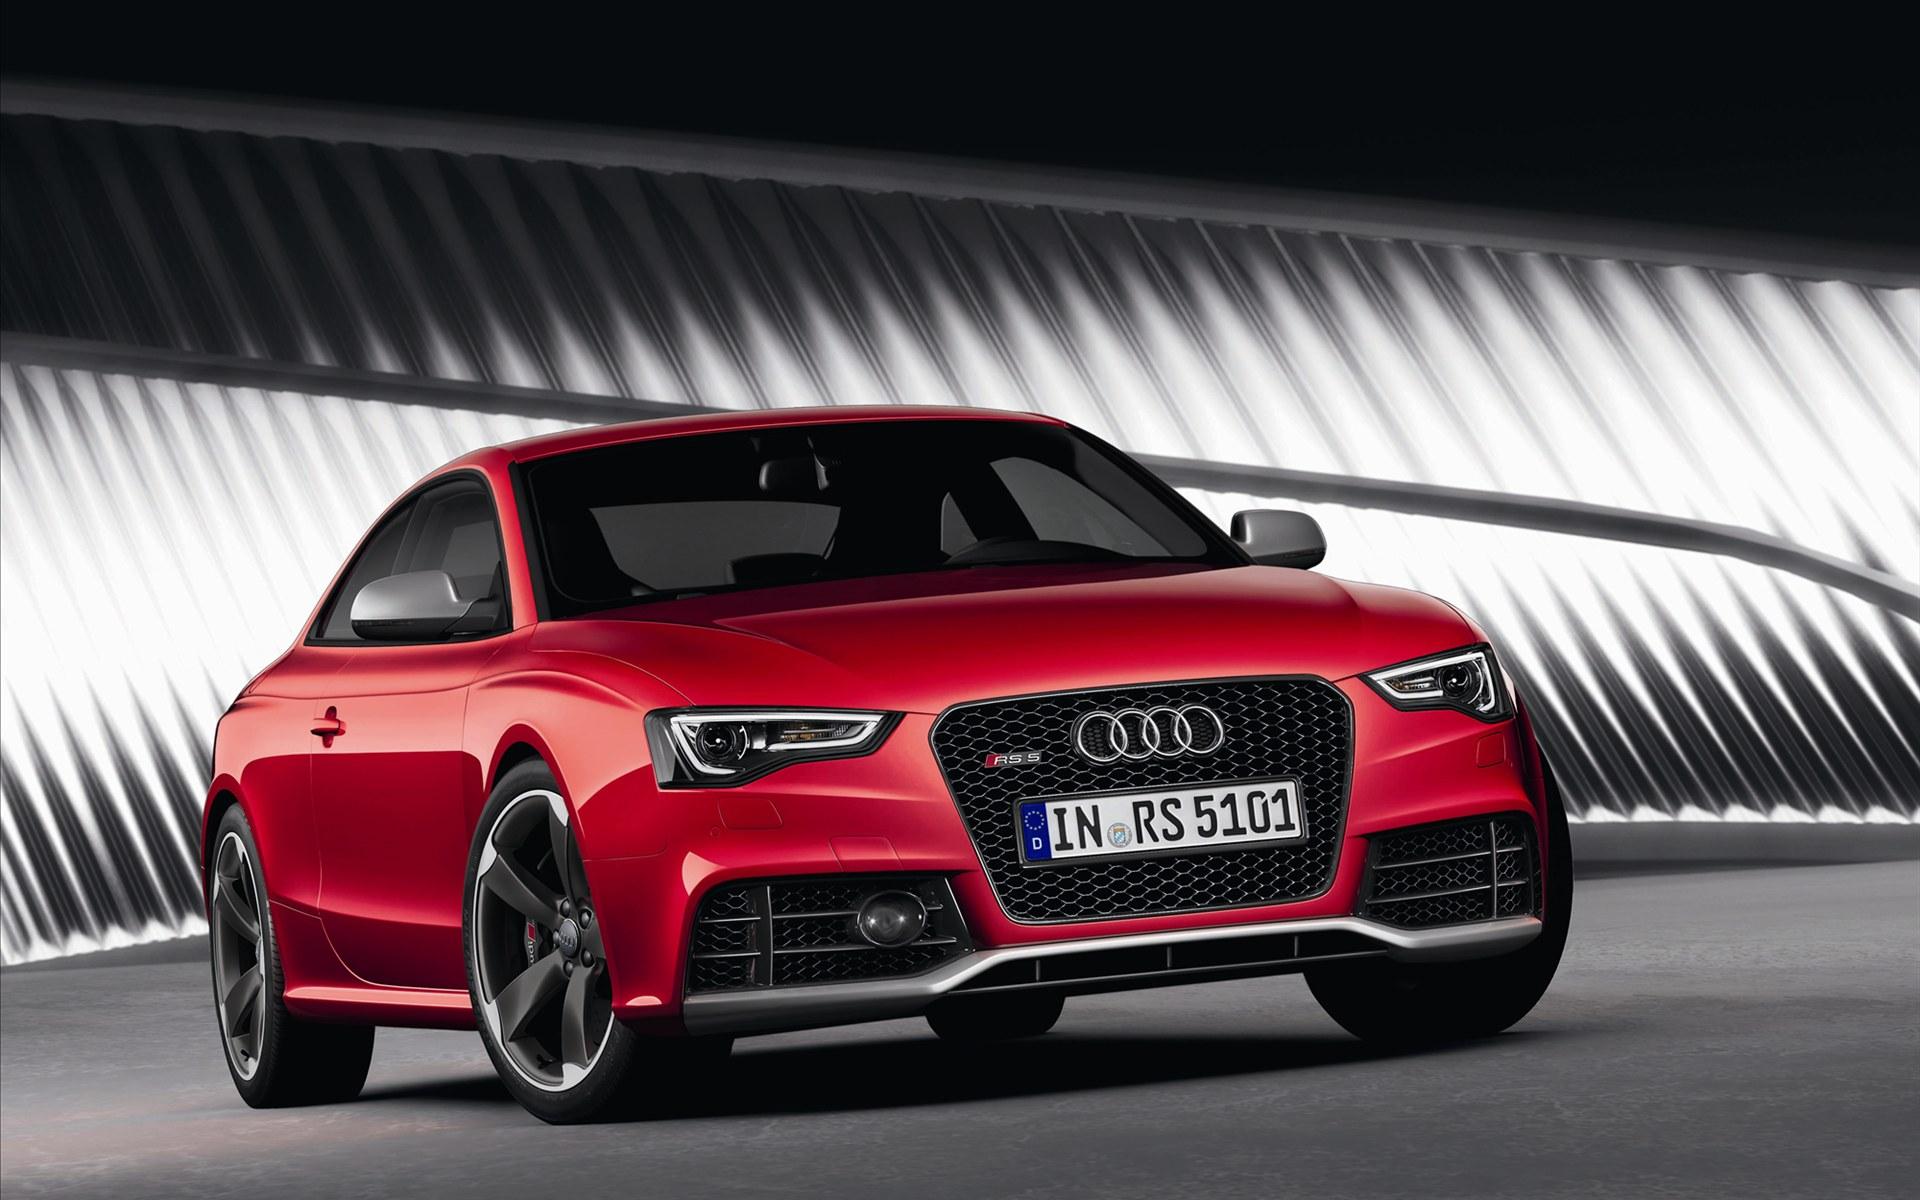 2016 Audi S5 Wallpaper Hd Audi Rs5 Coupe Red 1920x1200 Wallpaper Teahub Io